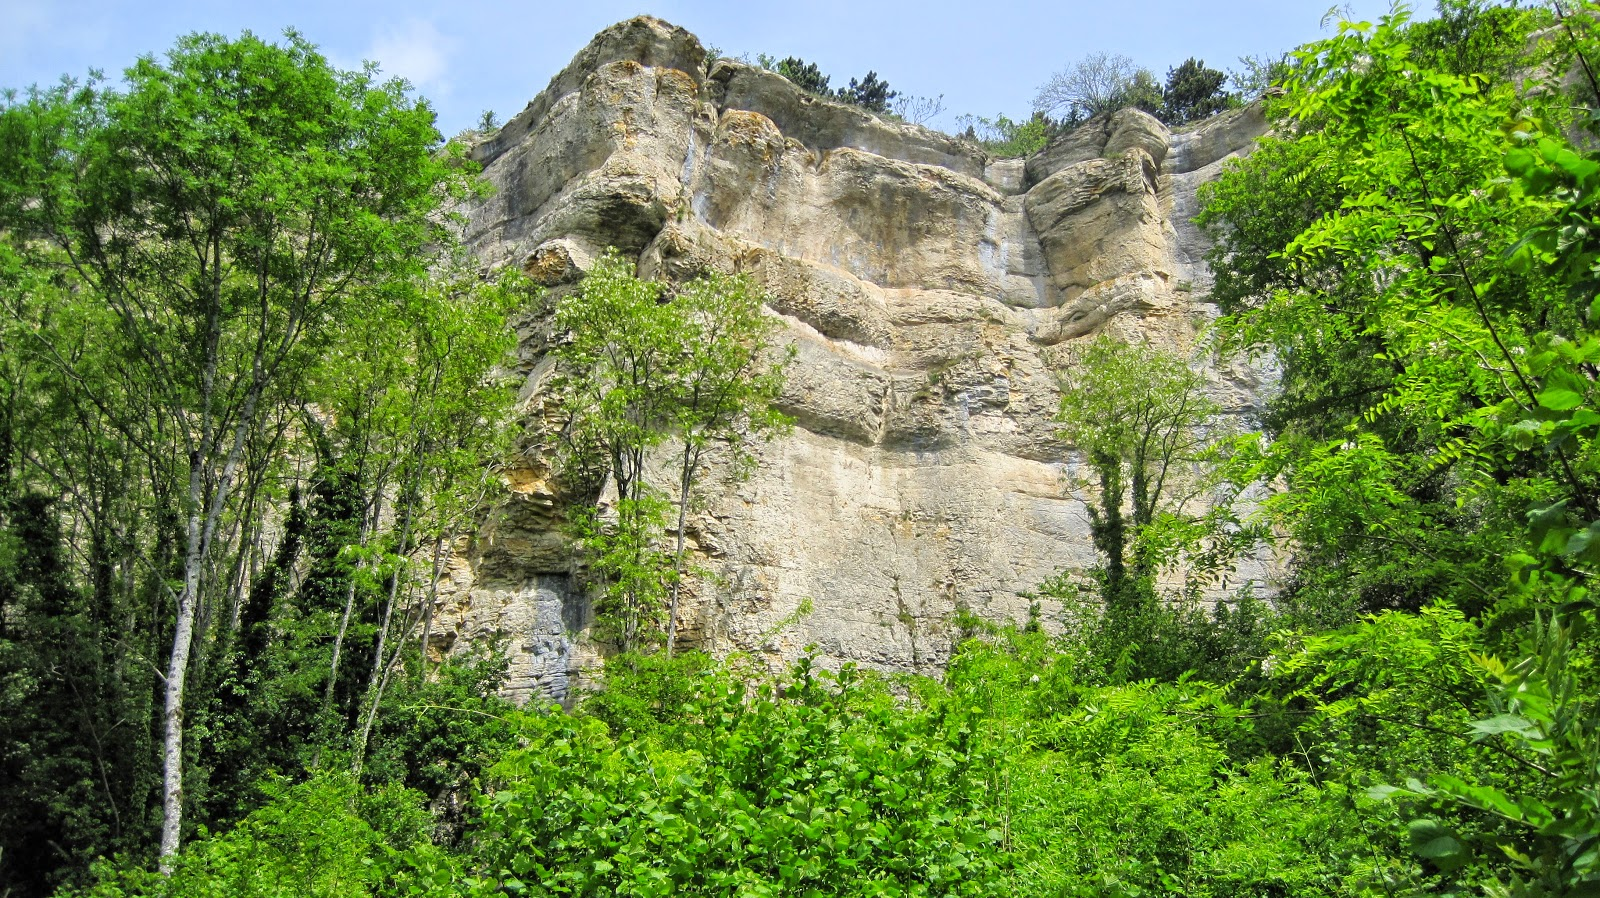 Cormot, climbing Burgundy